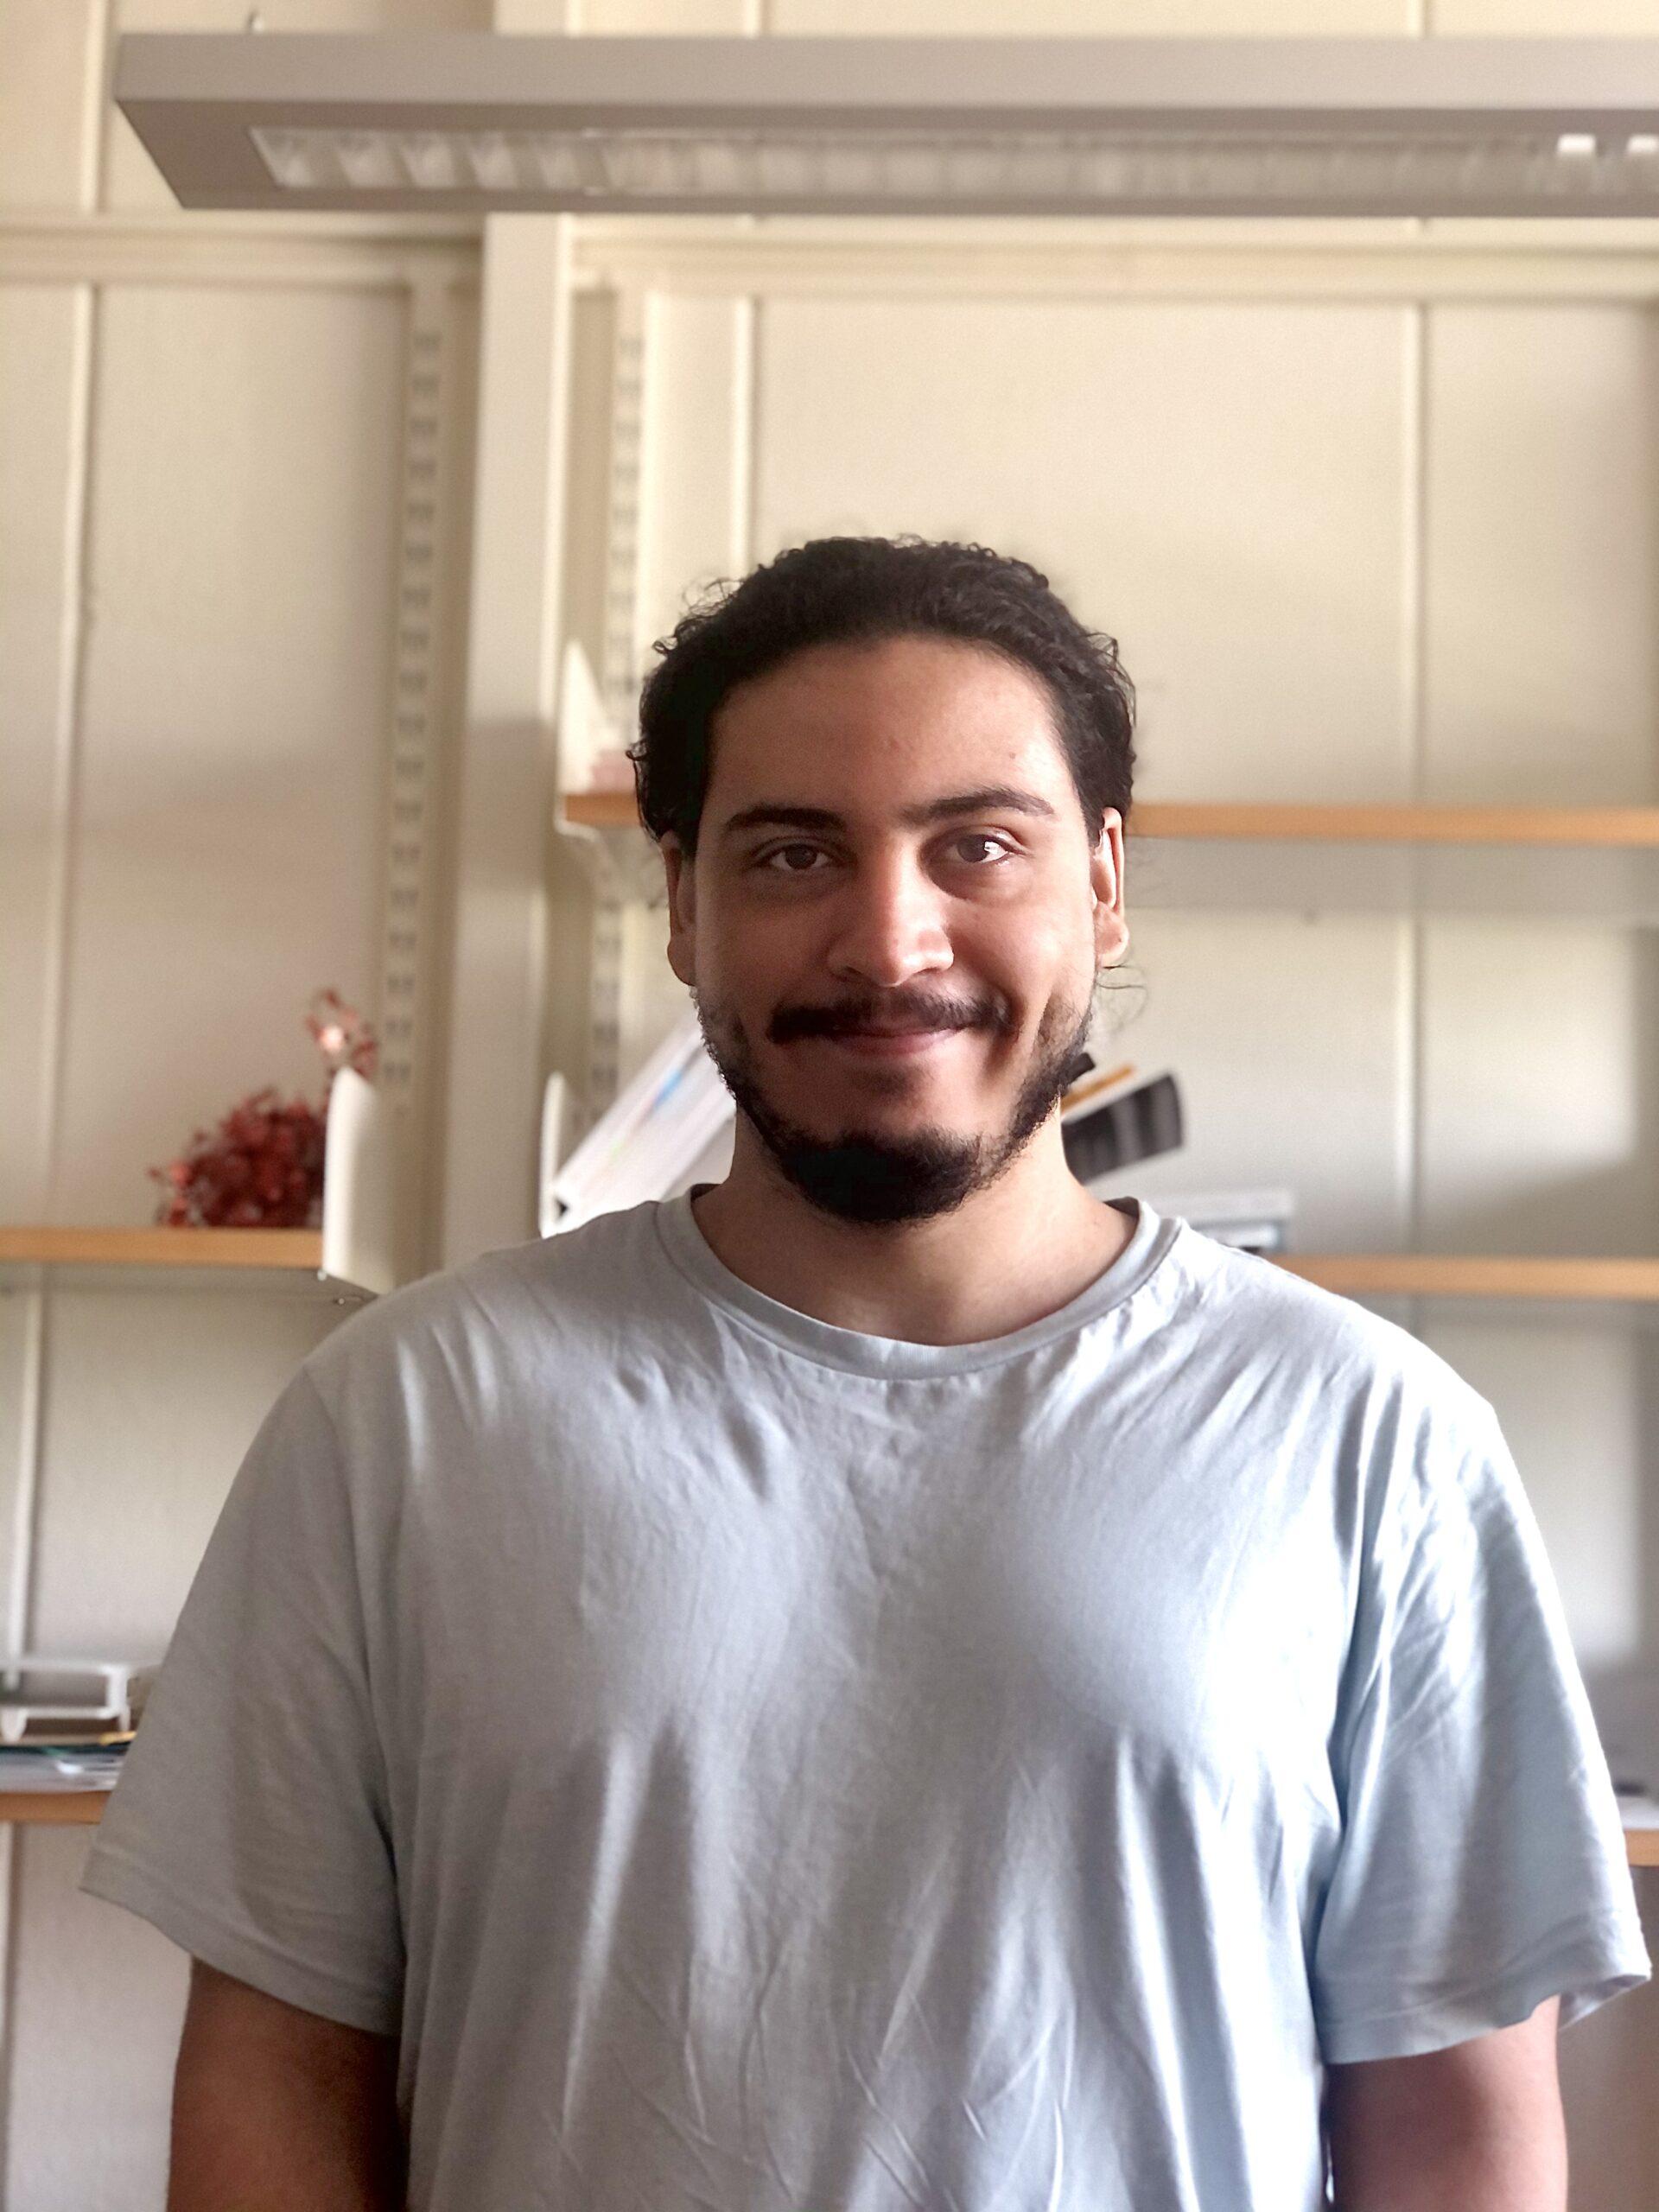 Ismail El Korde